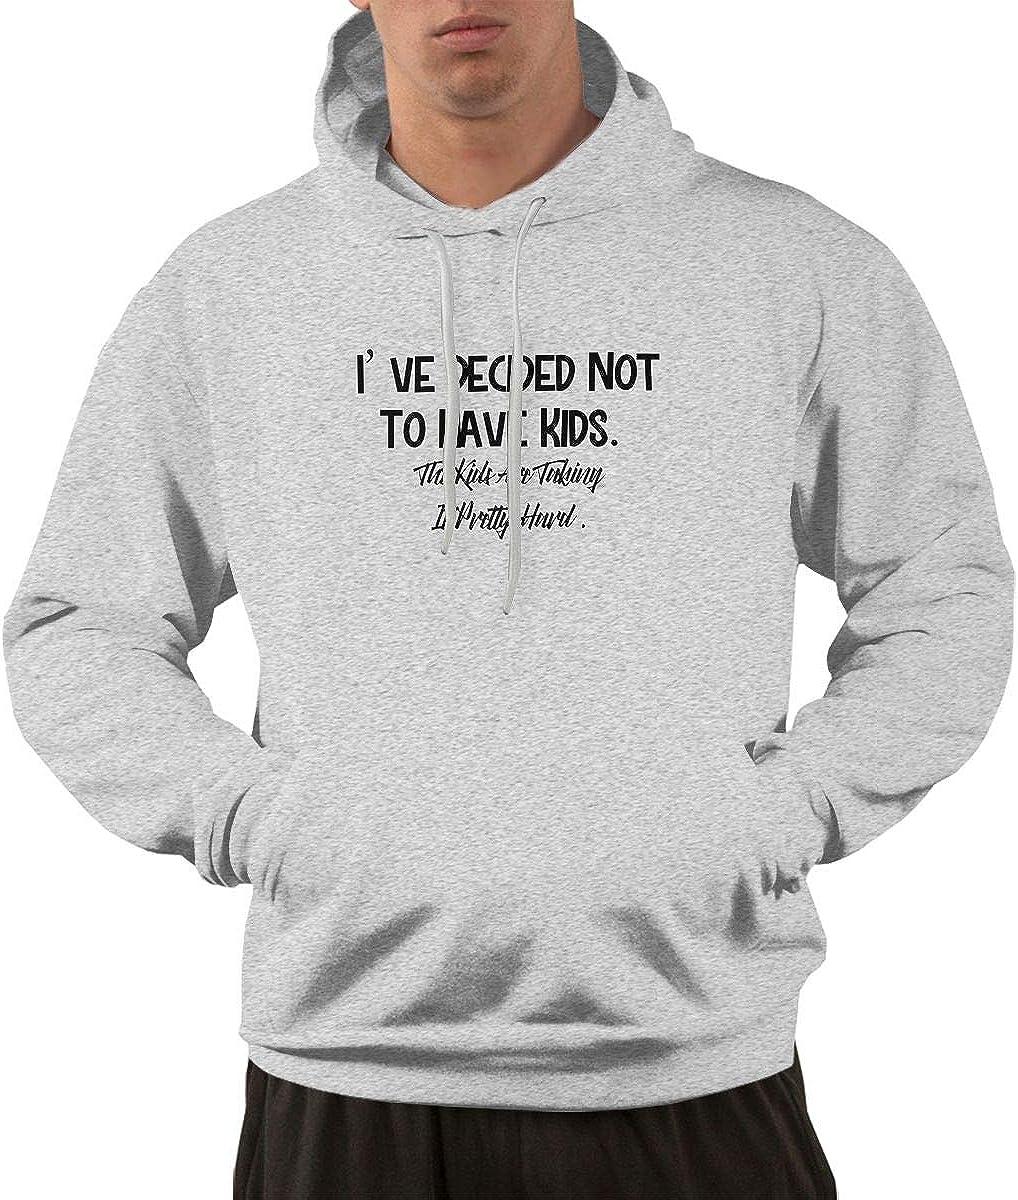 Ive Decided Not to Have Kids Drawstring Hooded Pullover Men Pocket Hoodie Sweatshirt